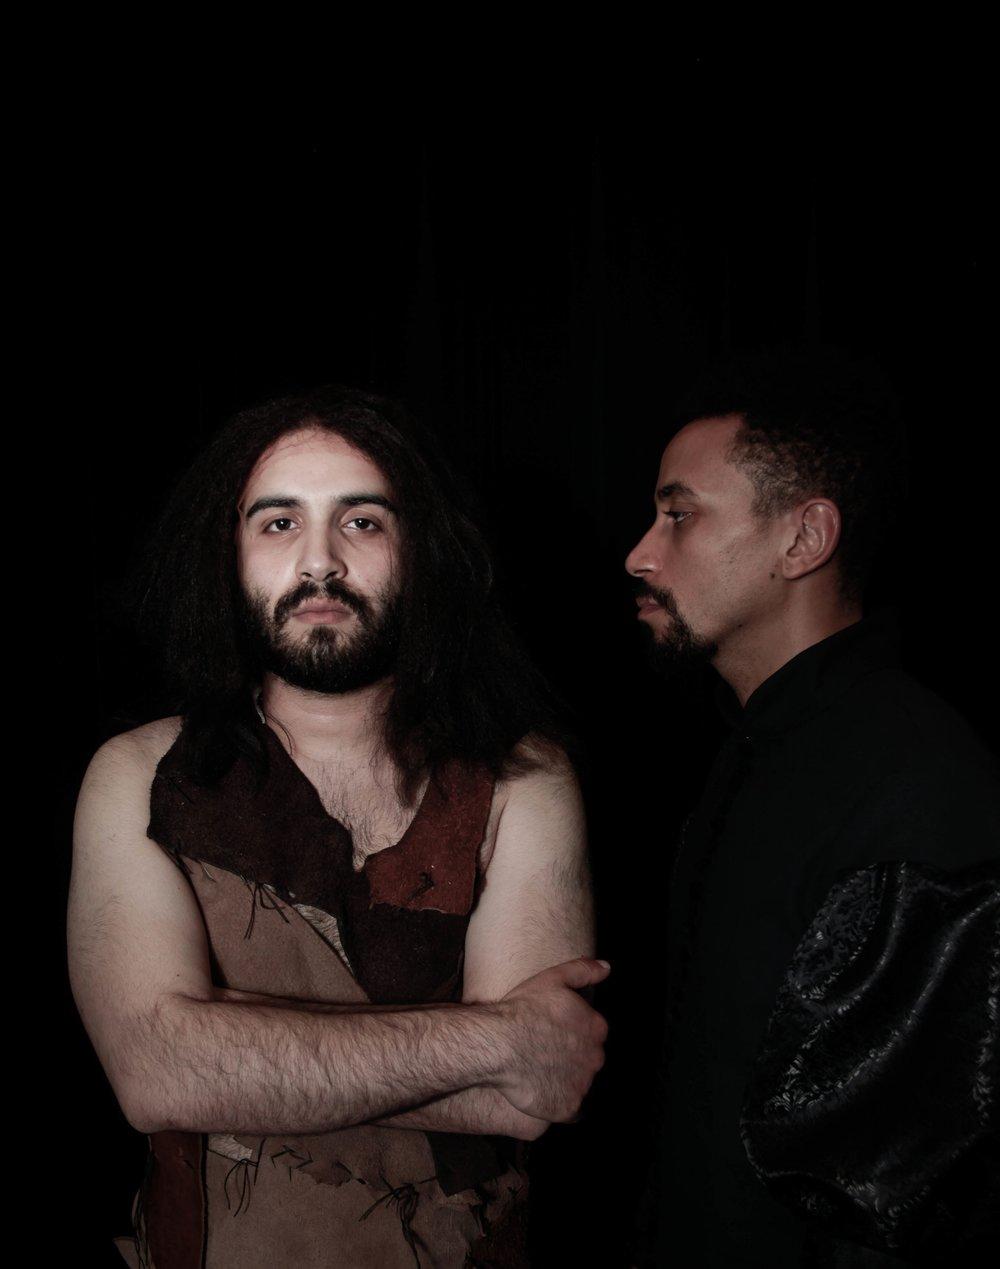 Adrian Tafesh & Allen Miller III Photo by Mike Hipple